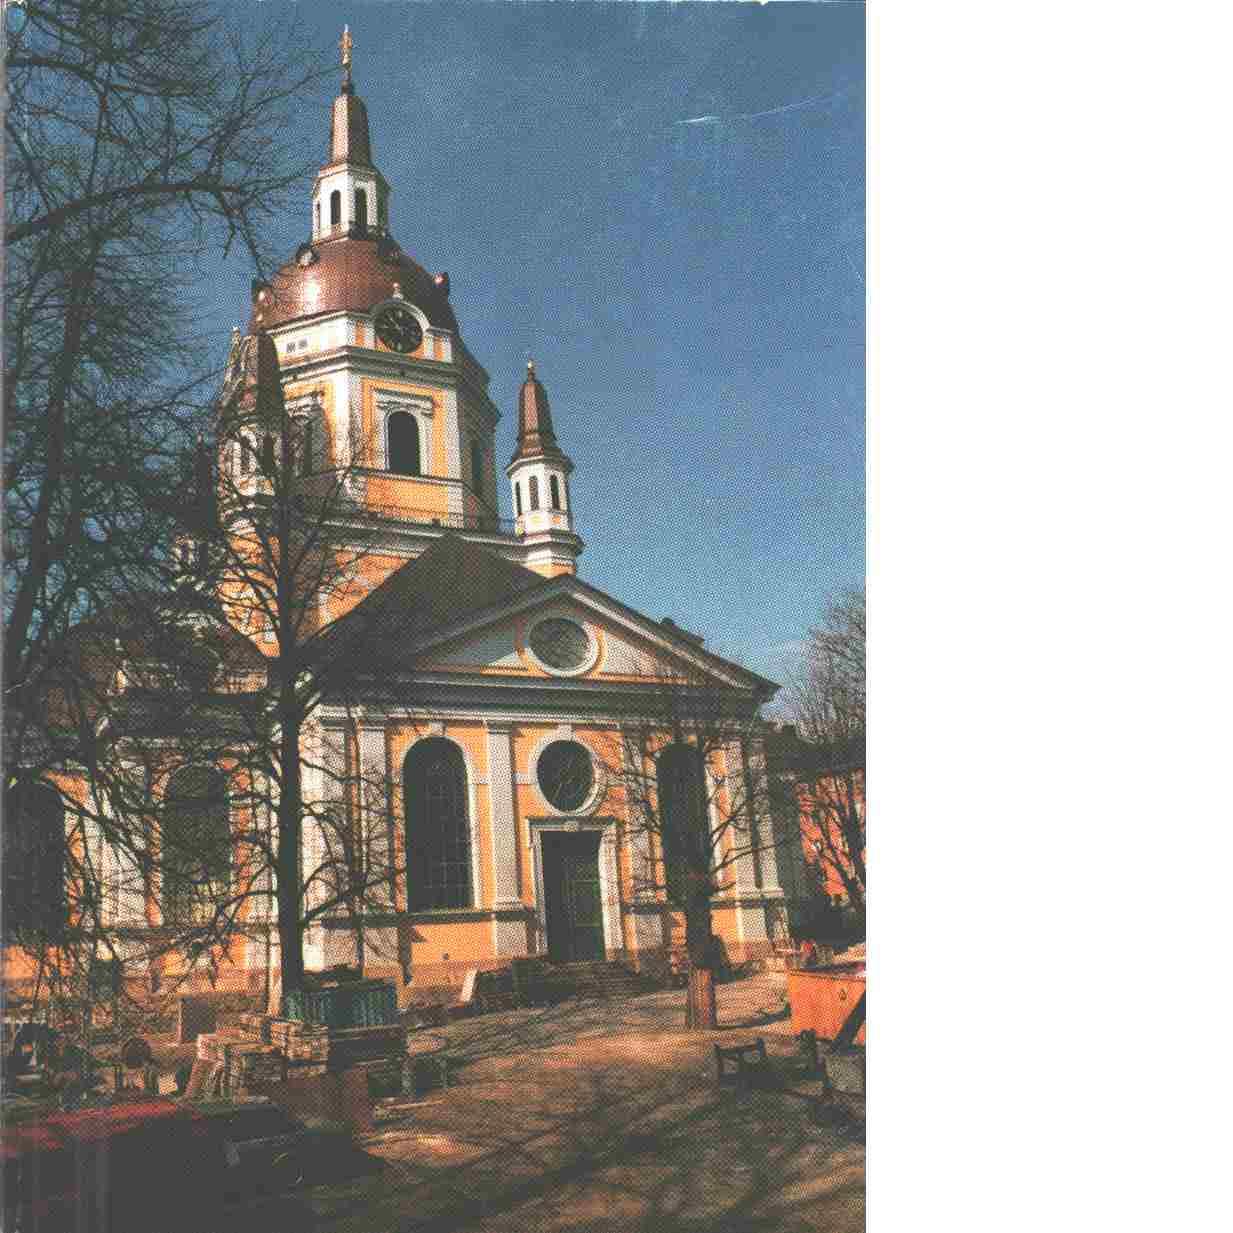 Katarina kyrka maj 1990-maj 1995 - Wigardt, Gaby